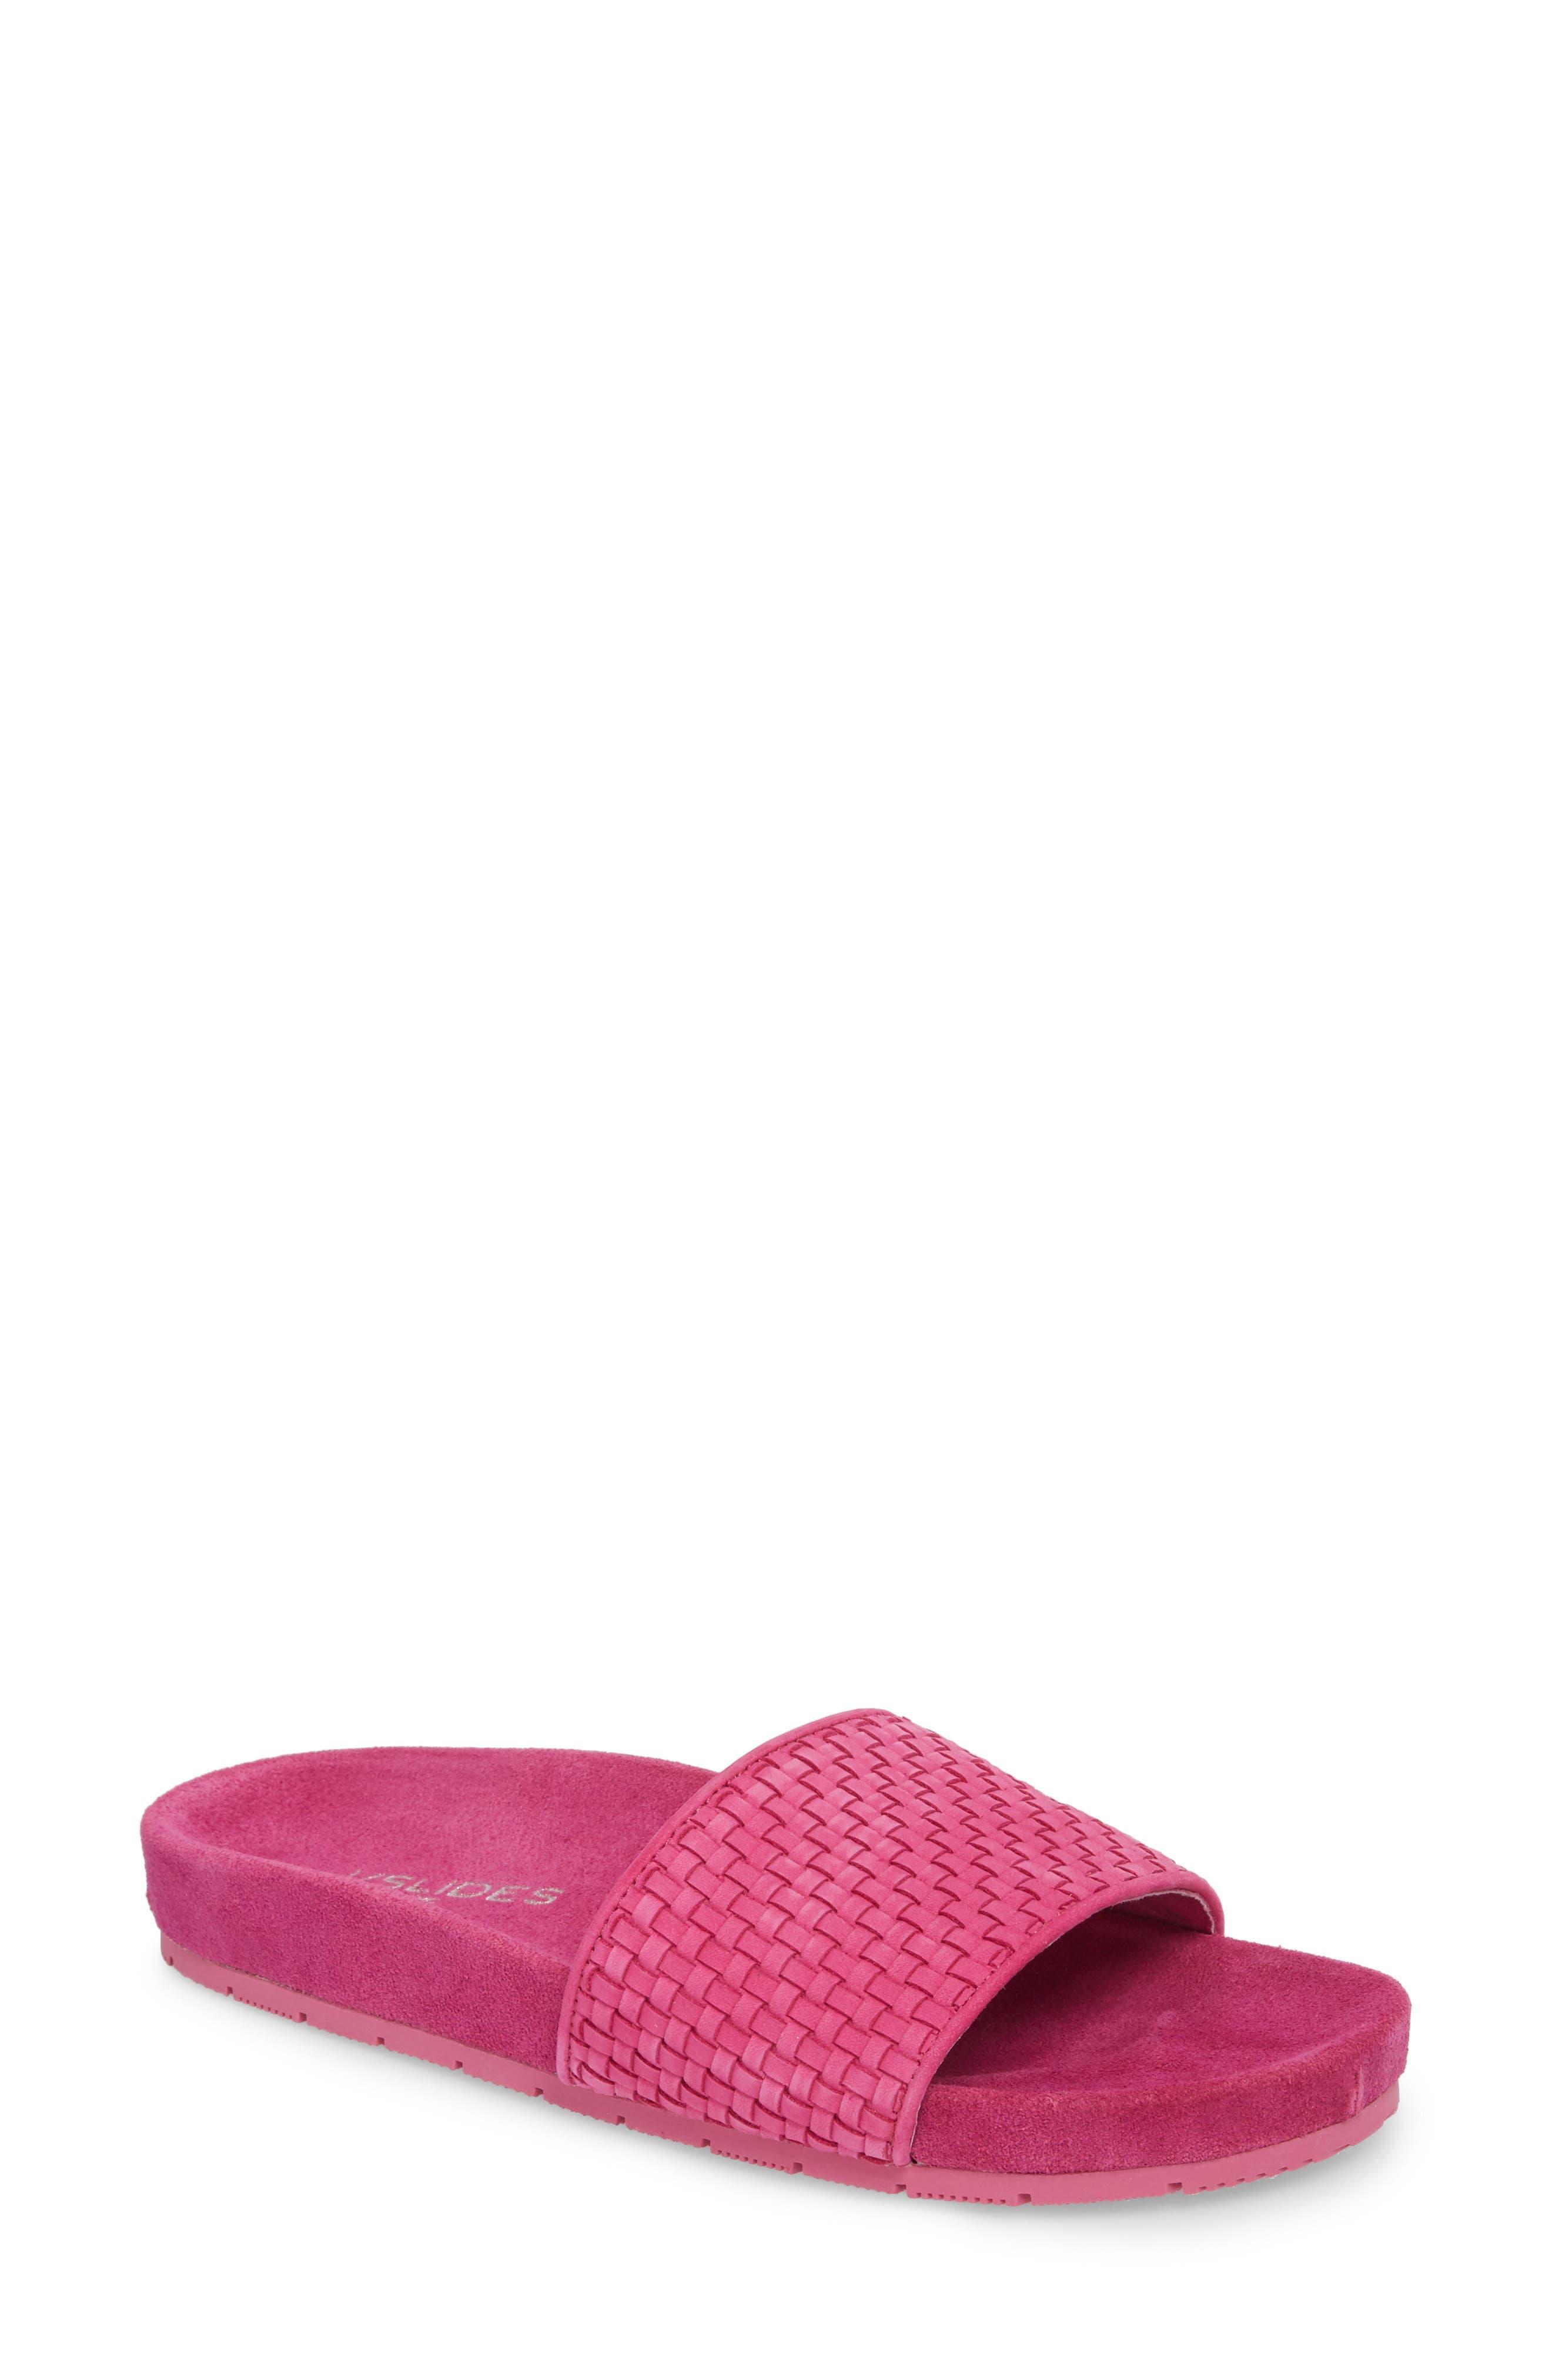 Naomie Slide Sandal,                             Main thumbnail 7, color,